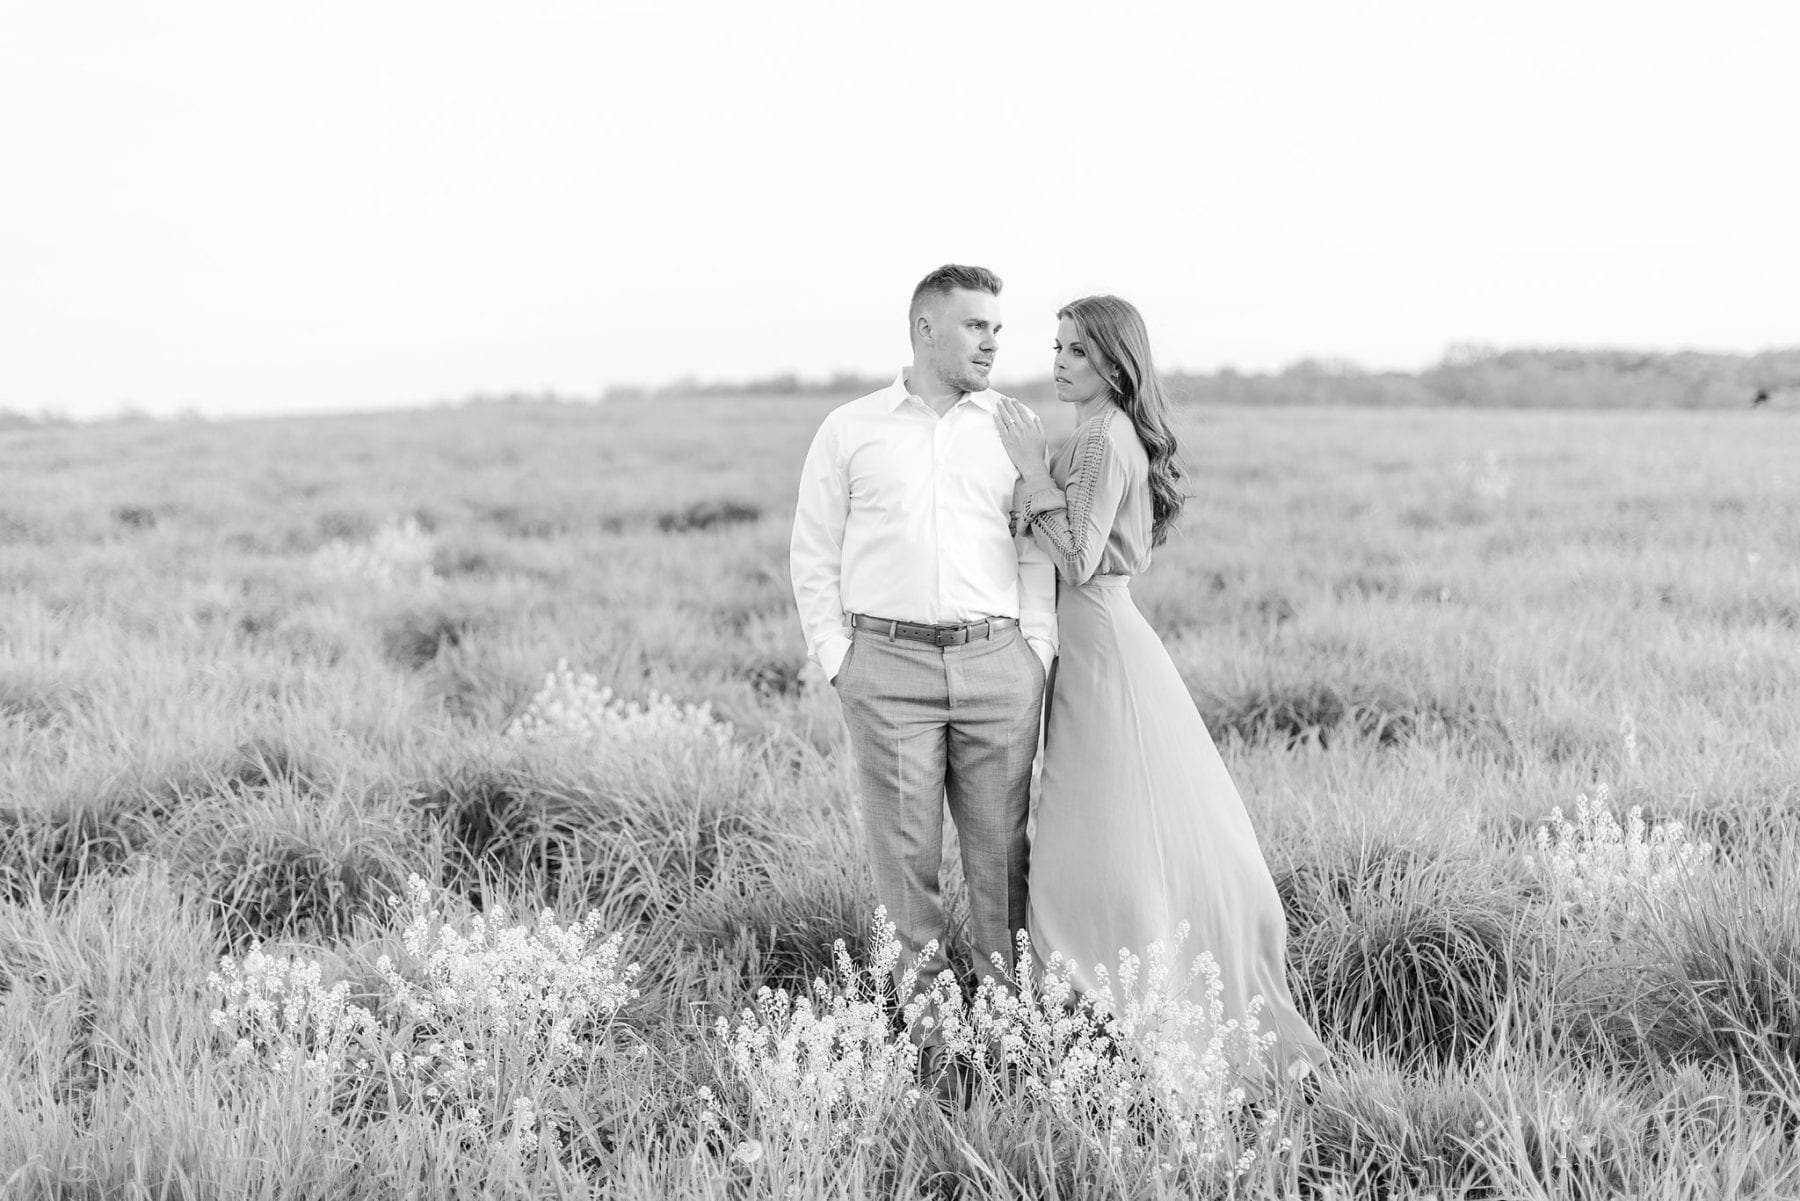 Goodstone Inn Engagement Session Virginia Wedding Photographer Megan Kelsey Photography-330.jpg